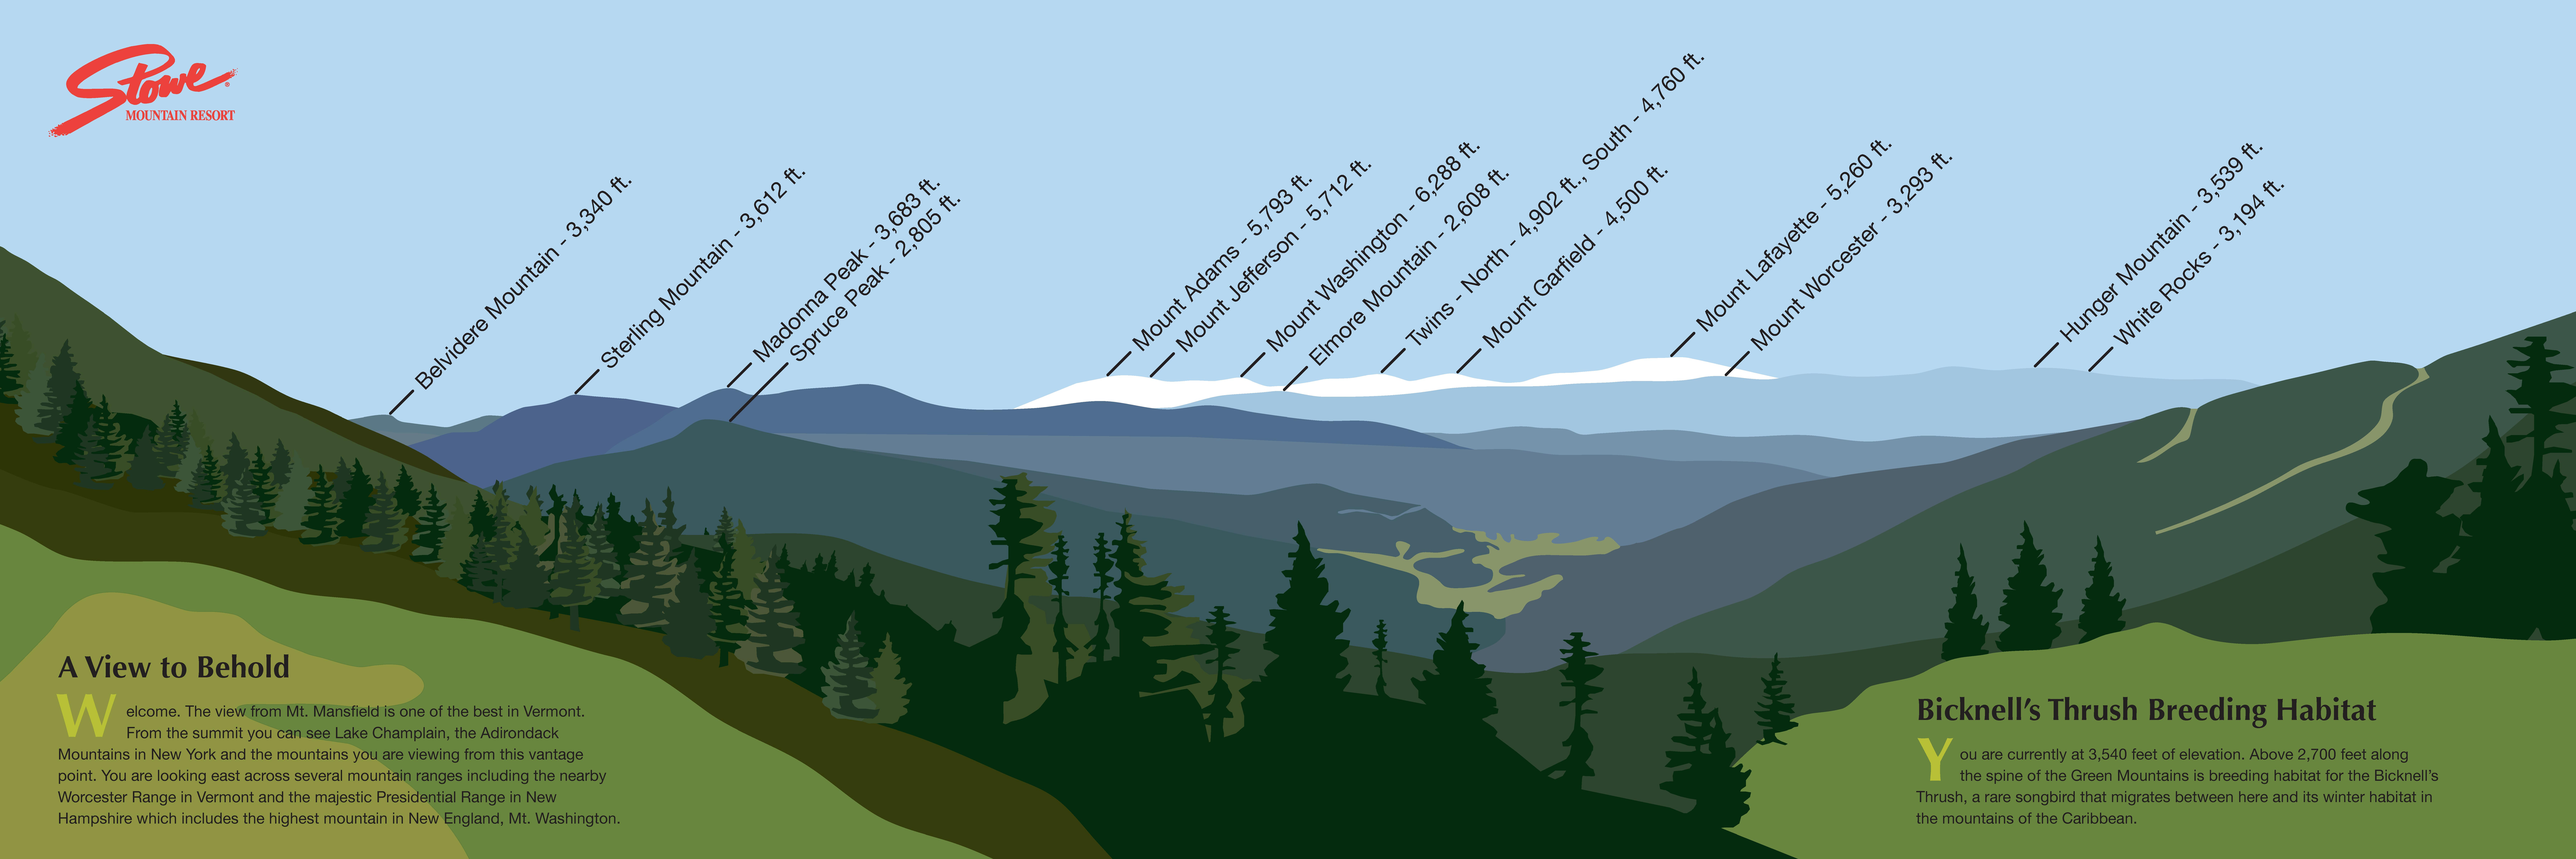 Stowe Mountain Resort Panorama-LOW RES FINAL-090716 copy